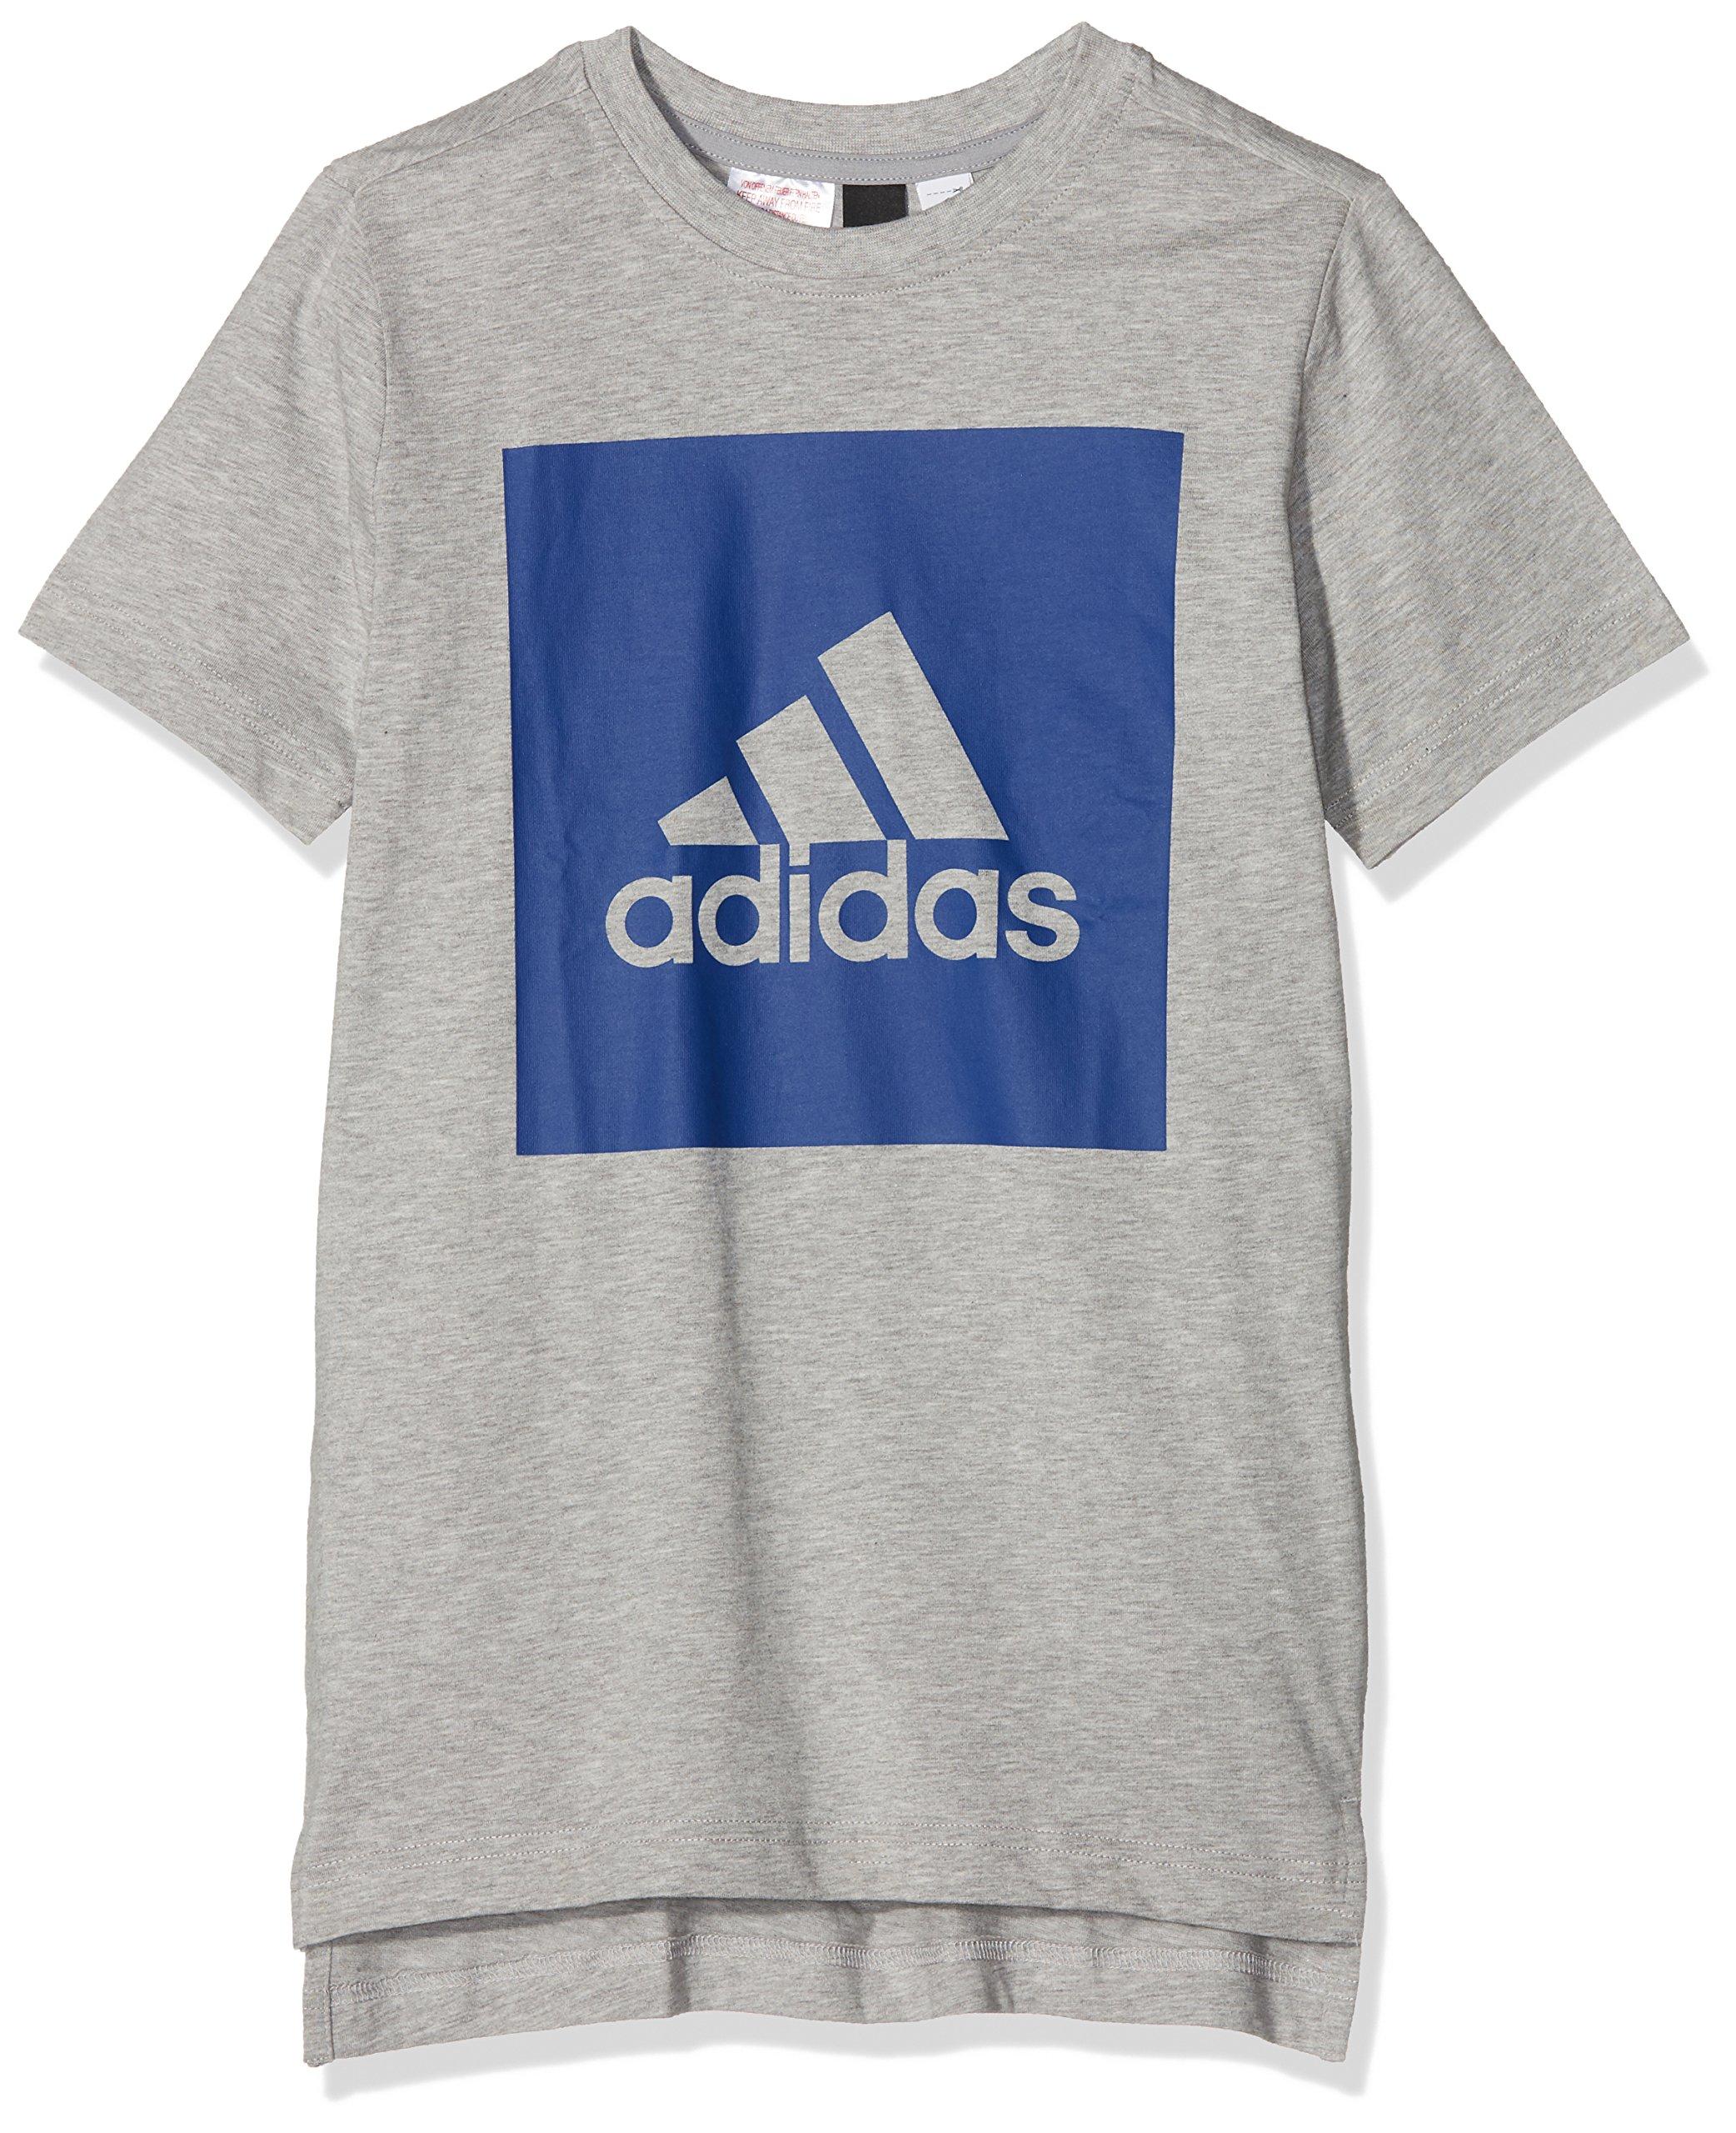 adidas Yb Logo Tee 2, Maglietta Unisex Bambini, Grigio (Brgrin/Reauni), 176